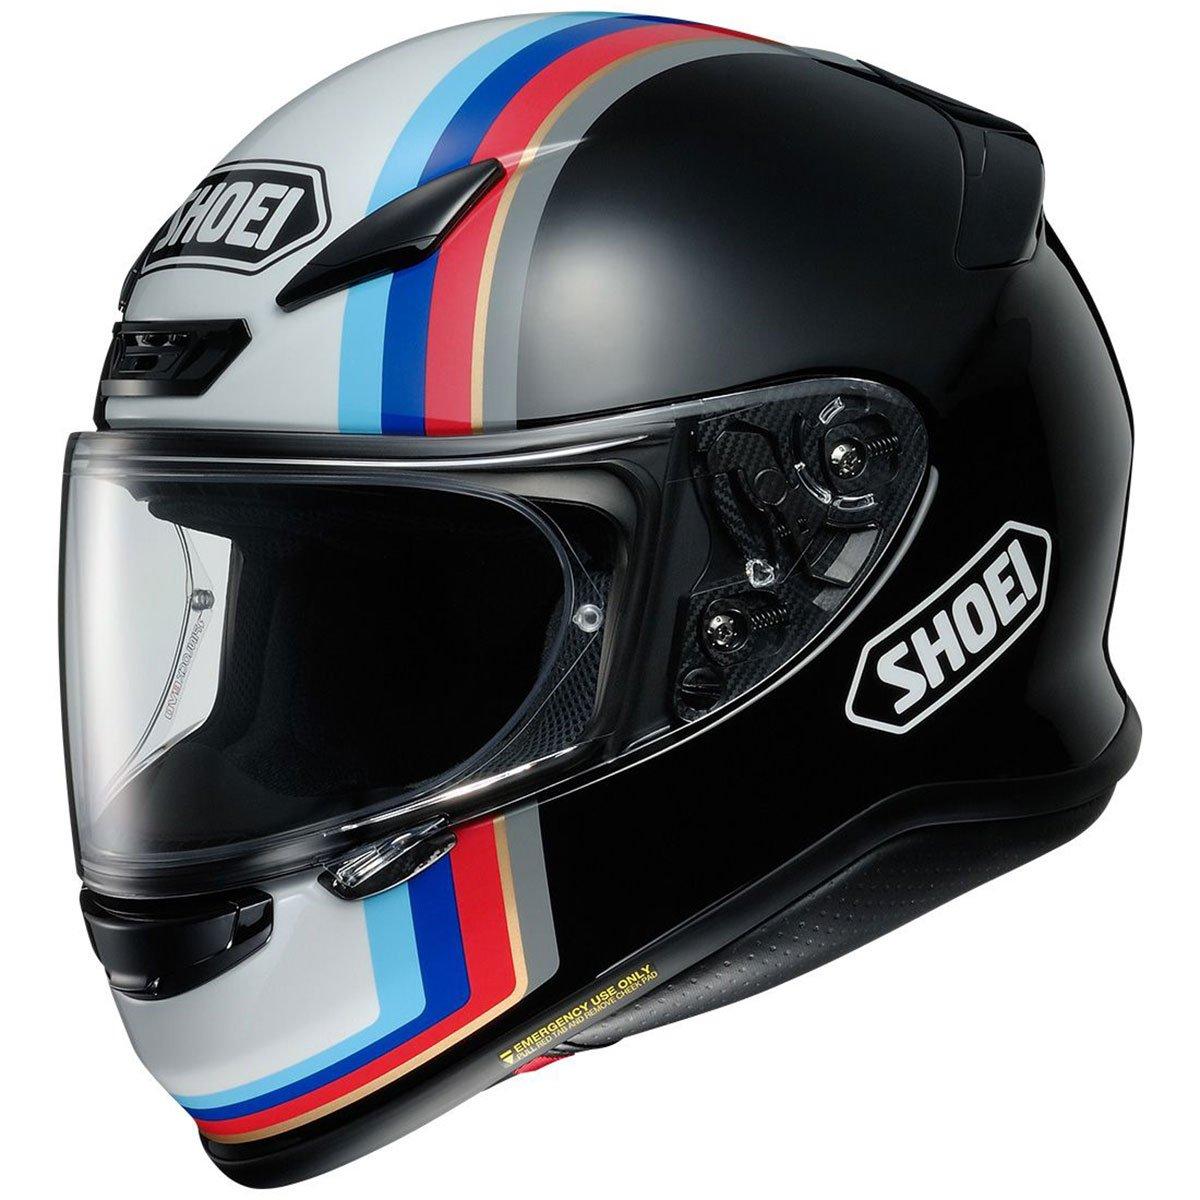 Shoei RF-1200 Recounter Sports Bike Racing Motorcycle Helmet - TC-10 / Large